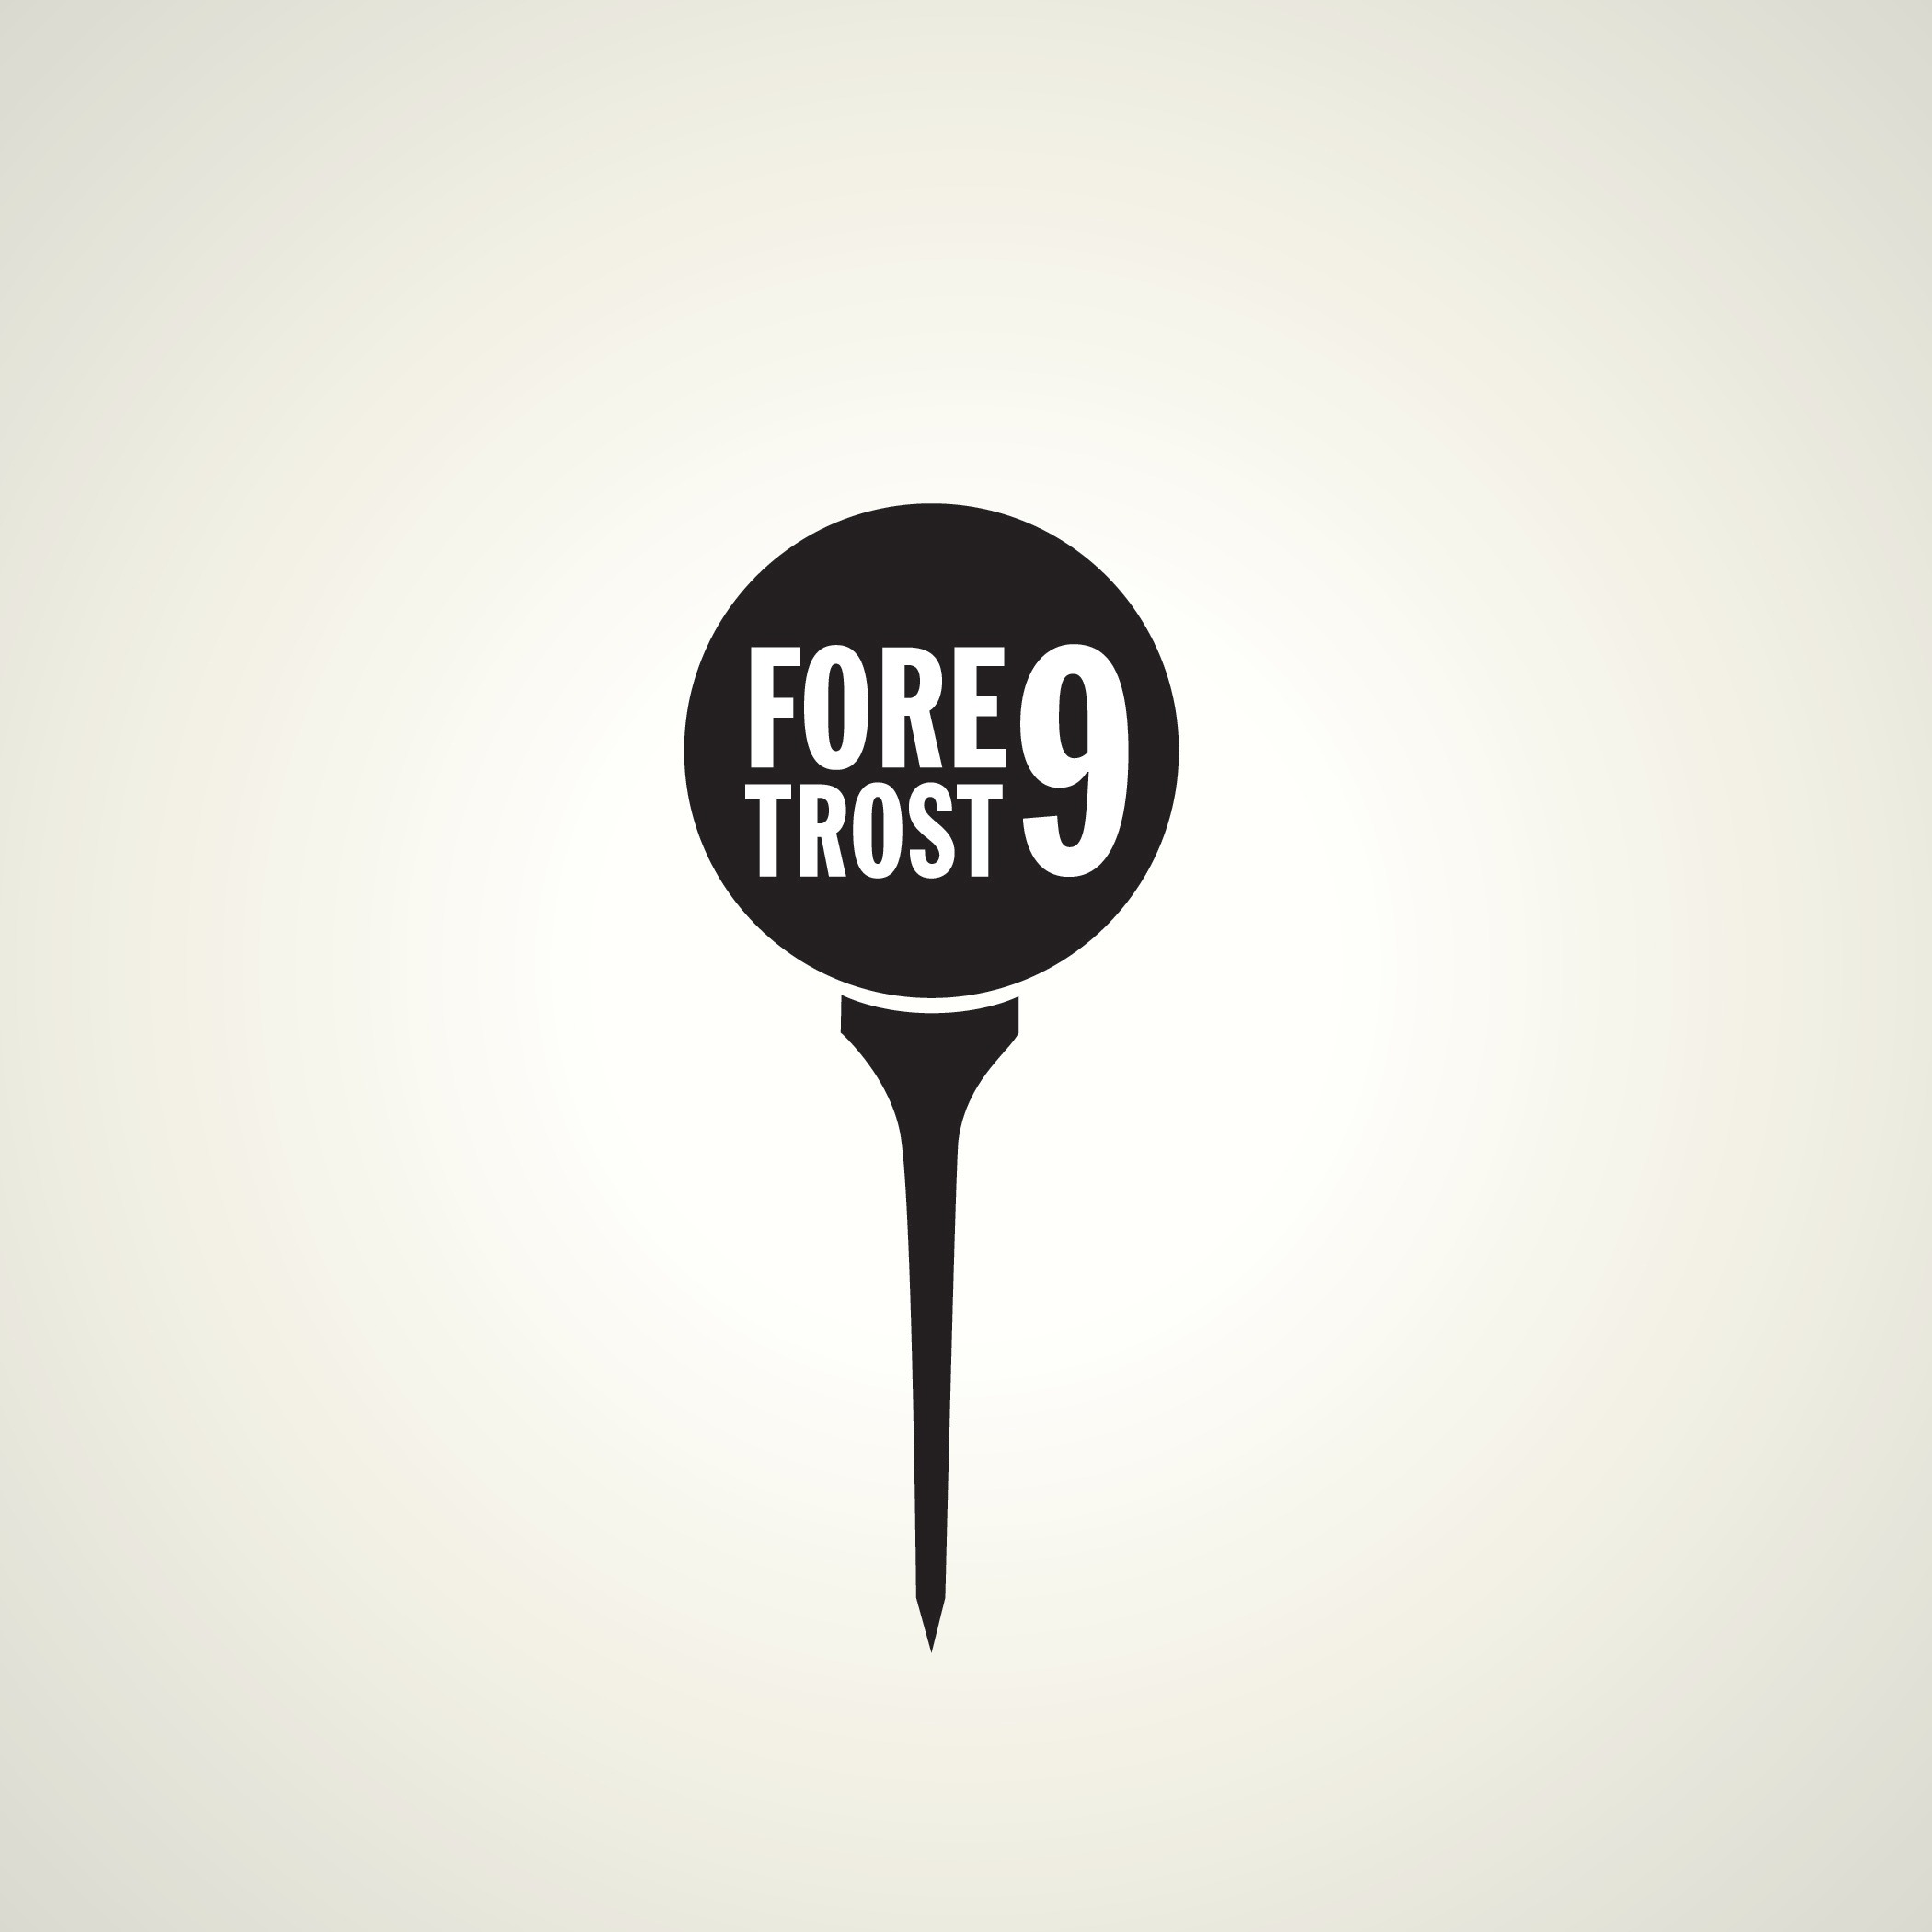 foretrost9logo